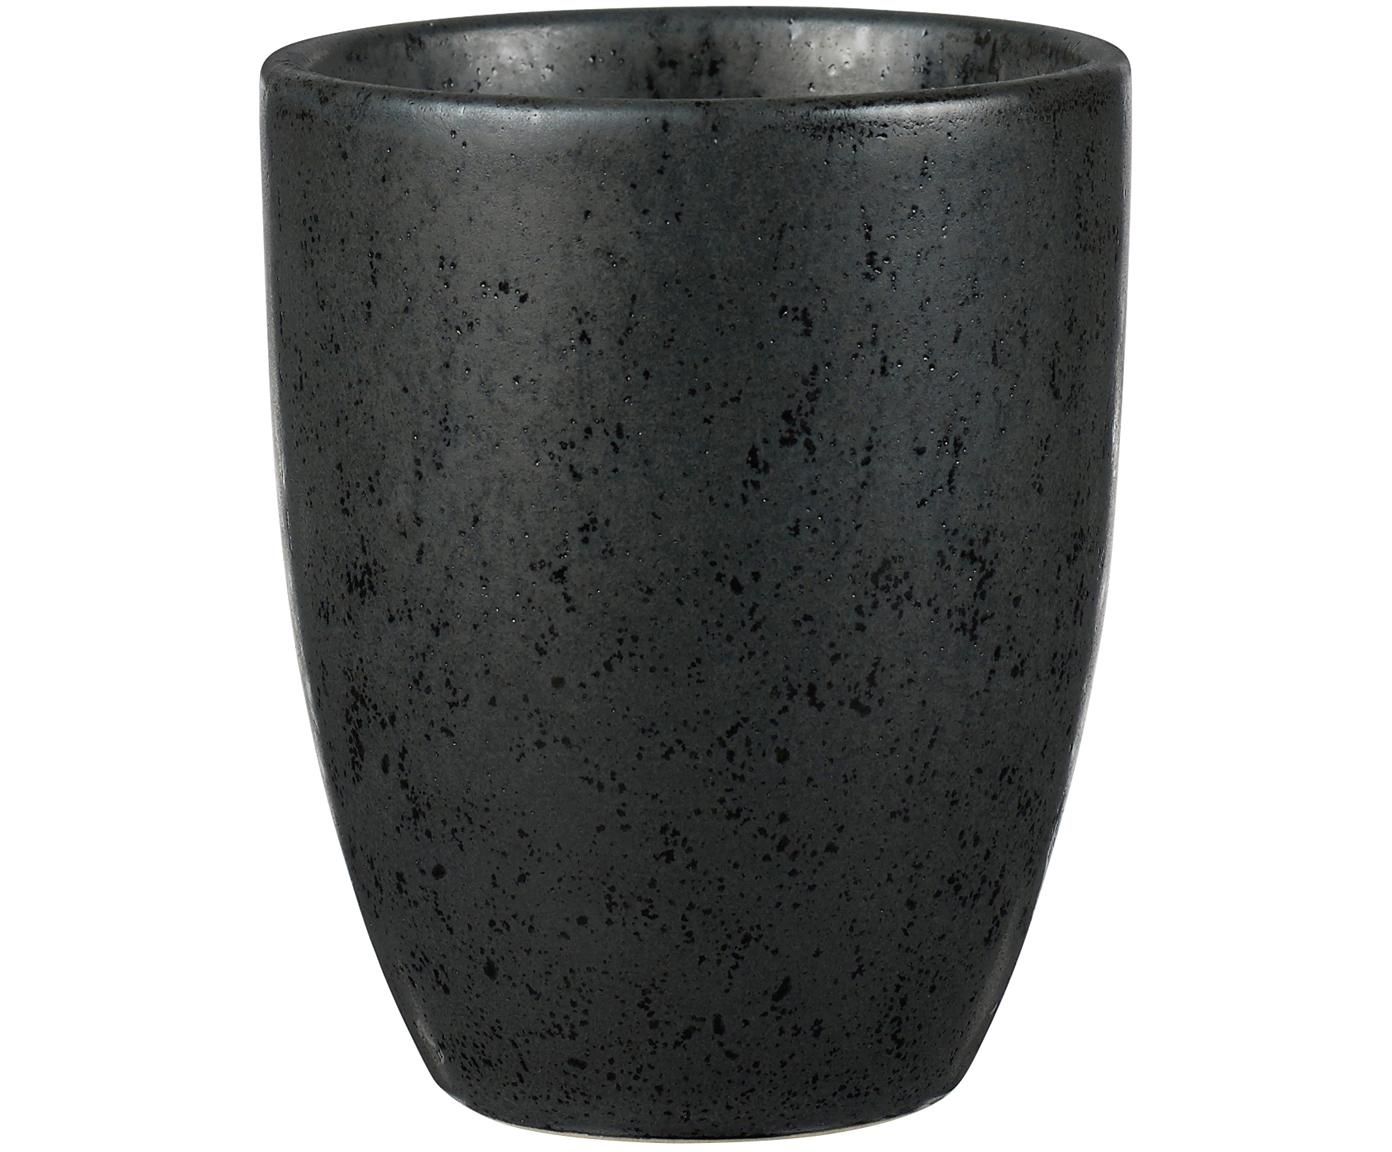 Kubek Stone, 2 szt., Kamionka szkliwiona, Czarny, Ø 8 x 10 cm